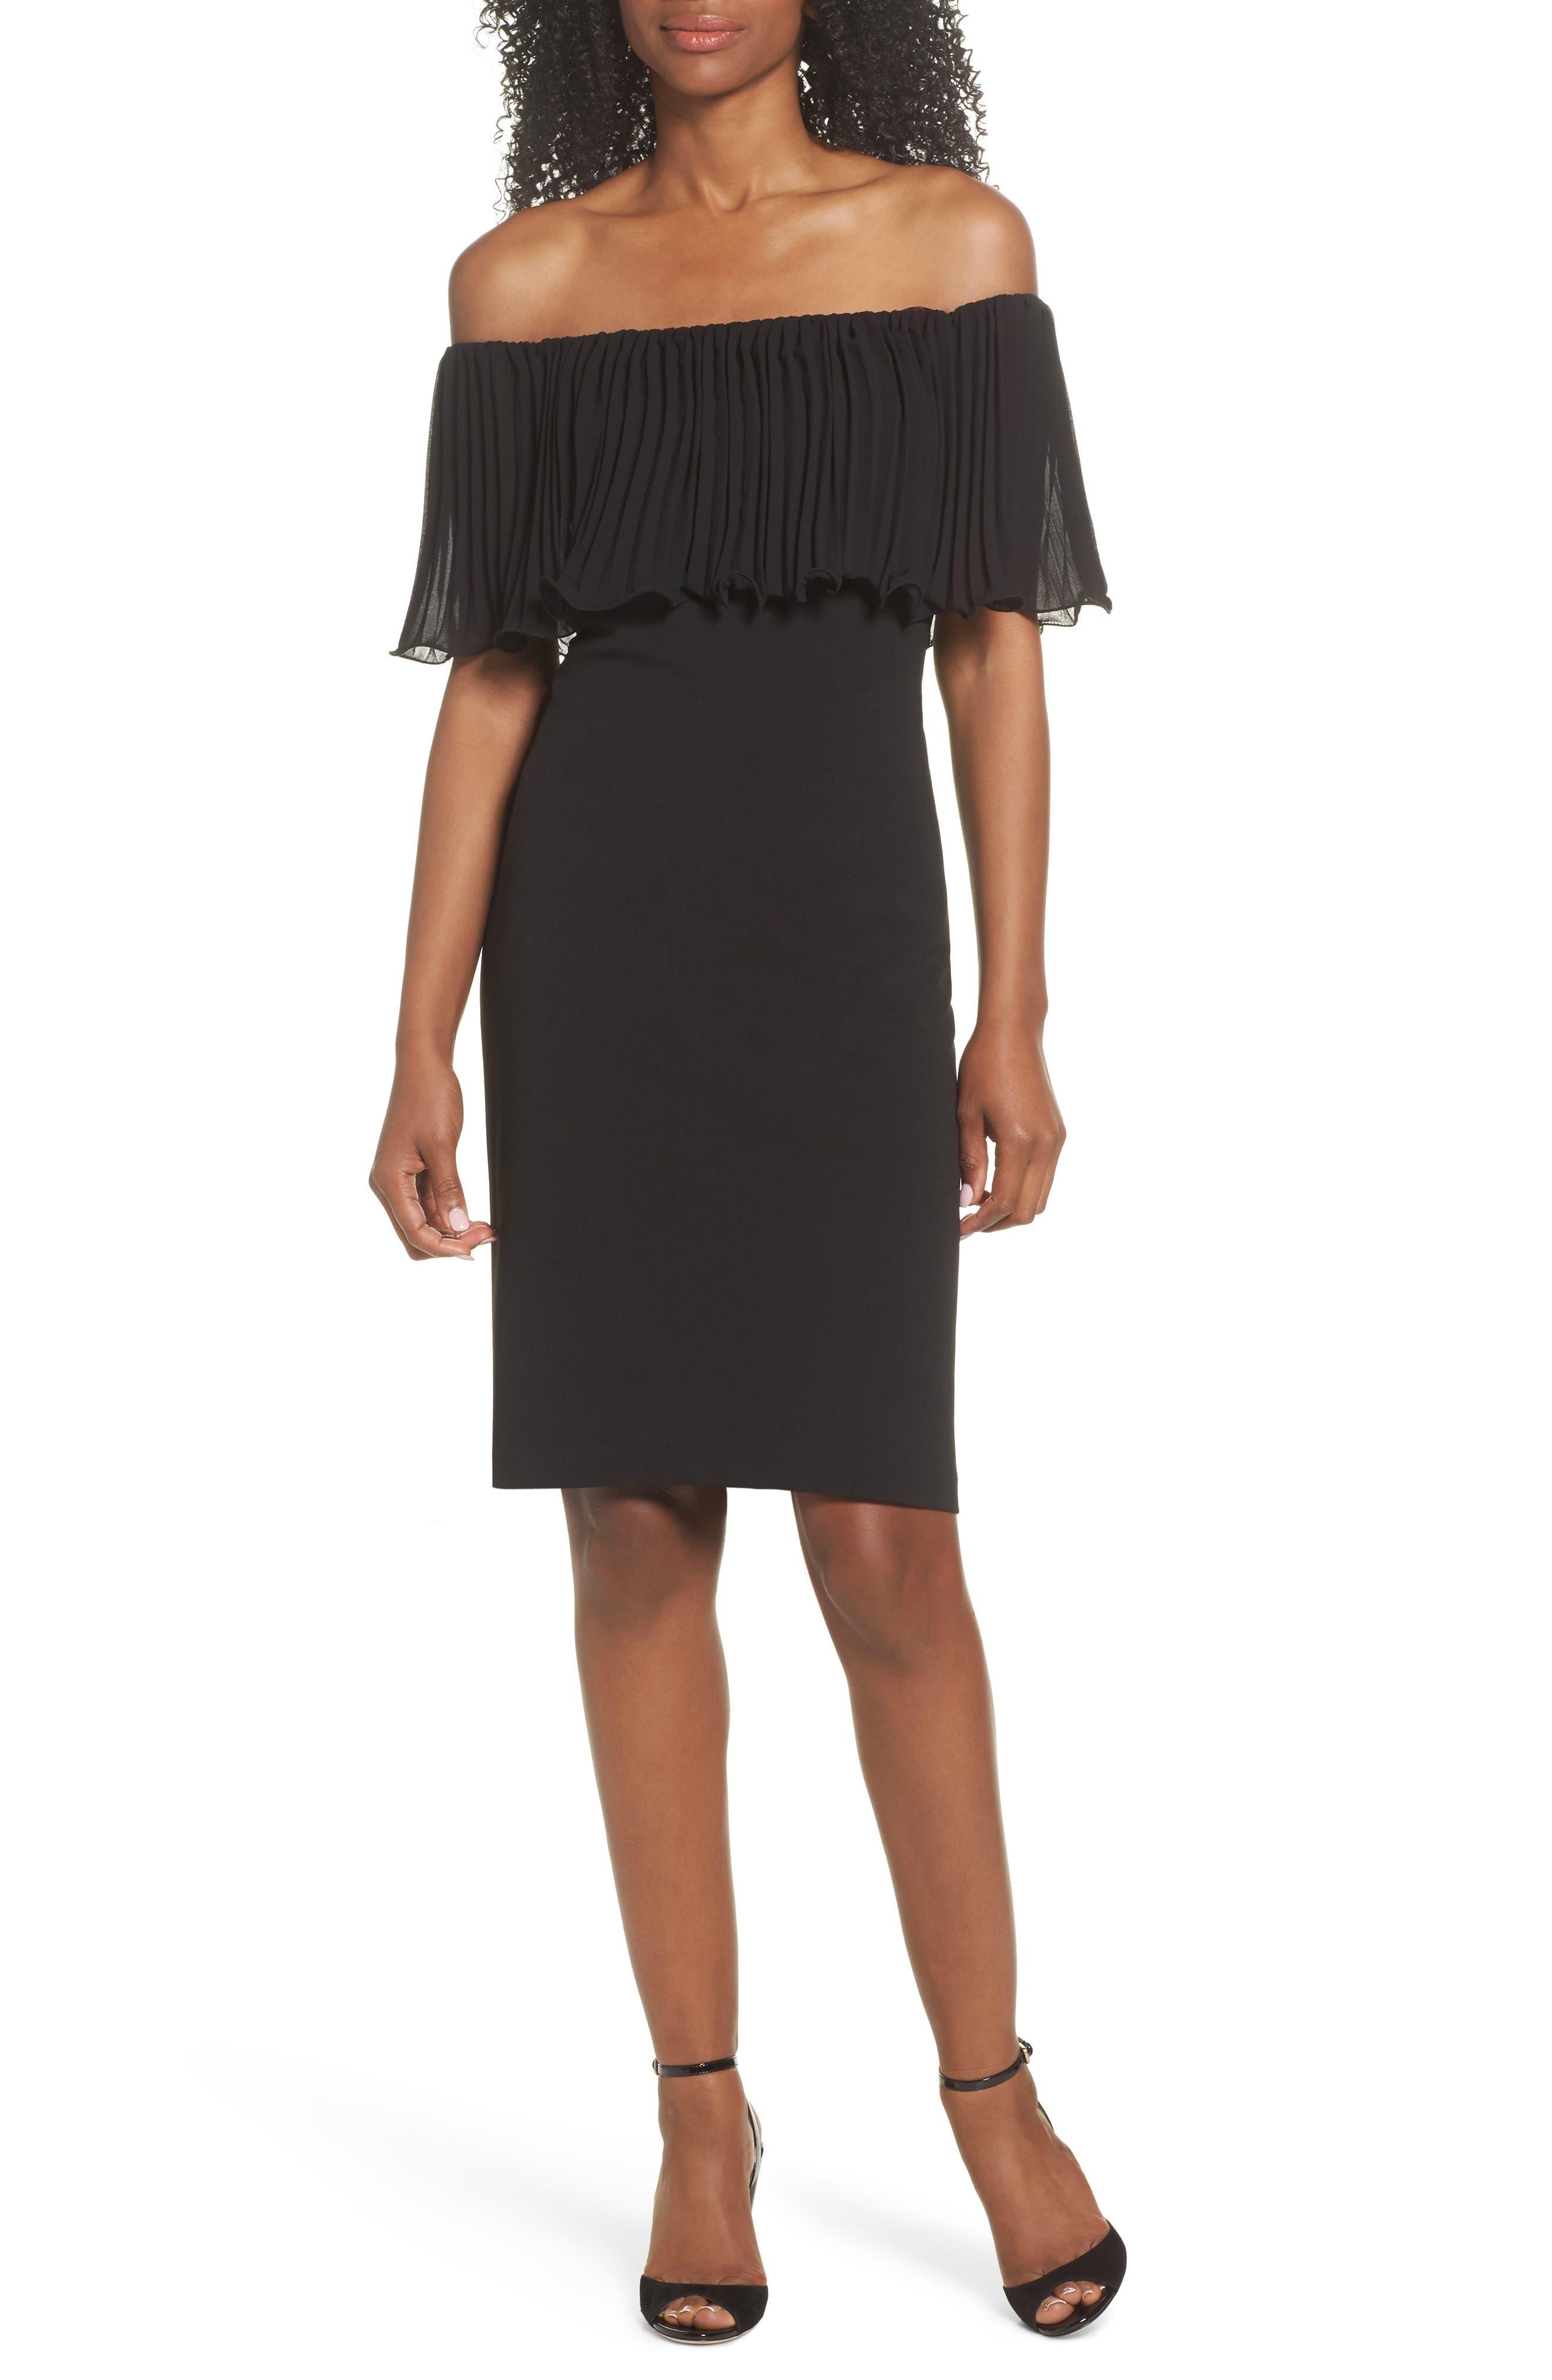 Pleat Ruffle Off the Shoulder Dress,                             Main thumbnail 1, color,                             Black